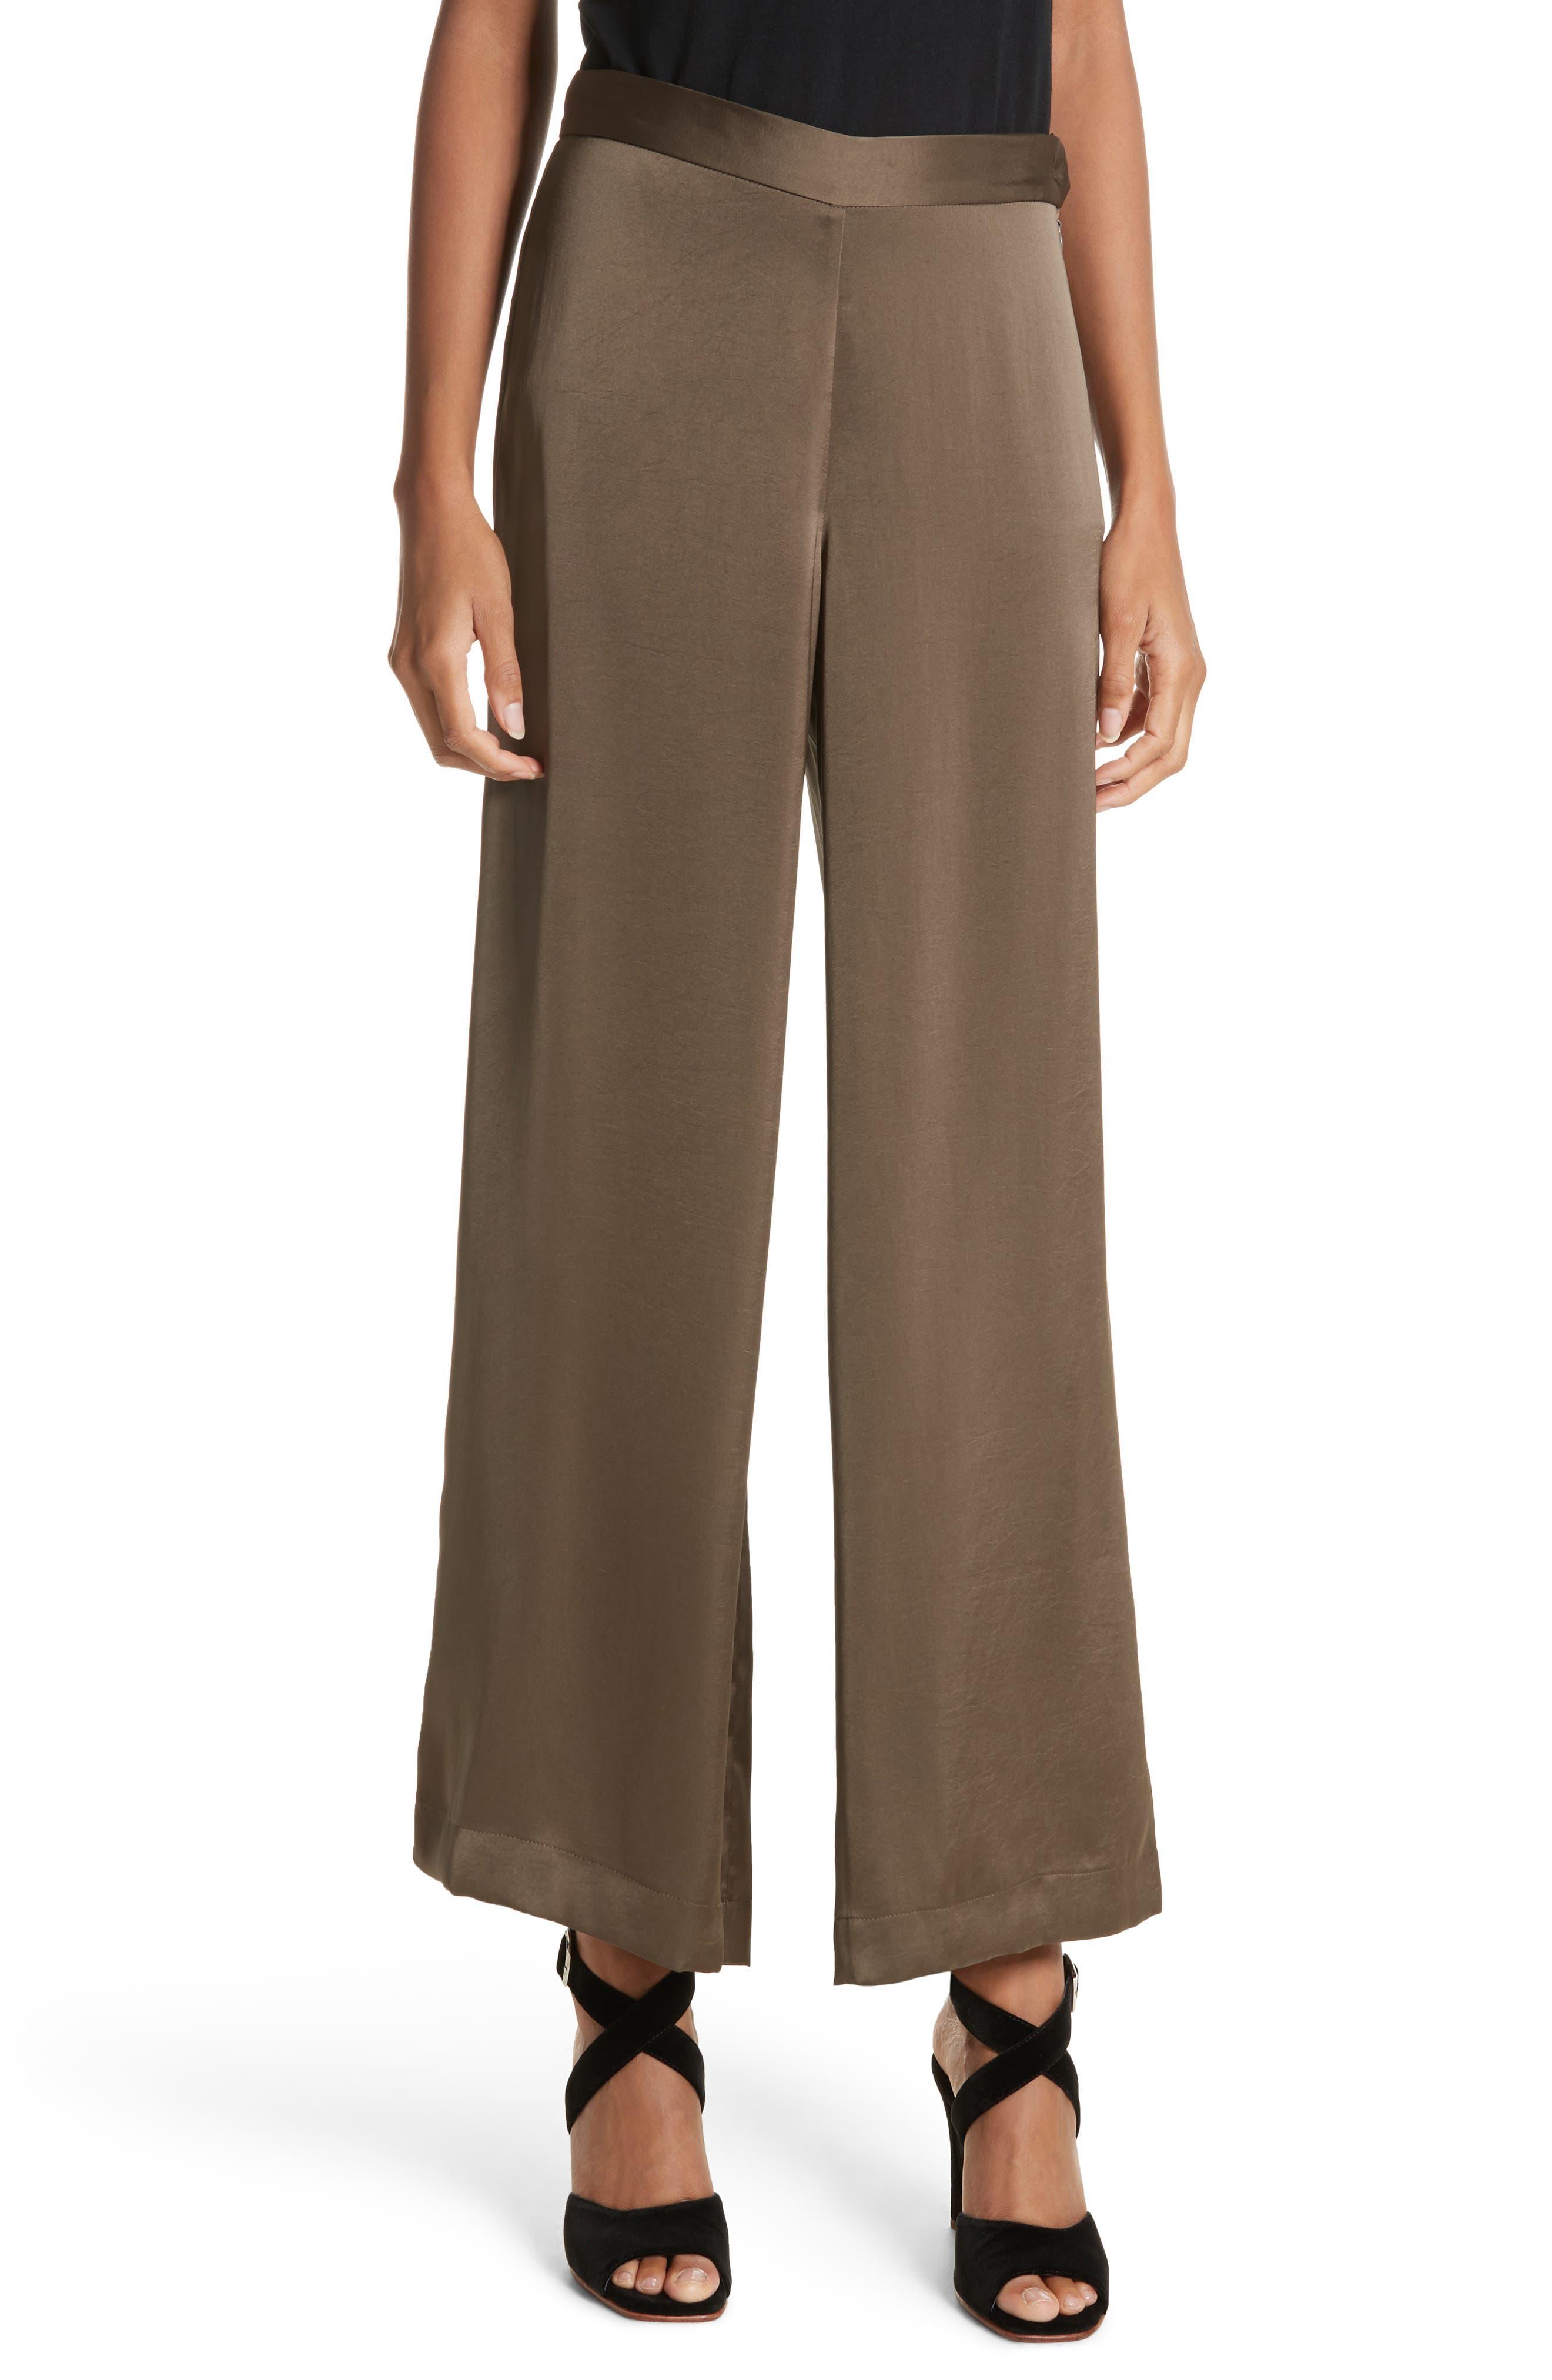 Cleric Satin Wide Leg Pants,                         Main,                         color, Khaki